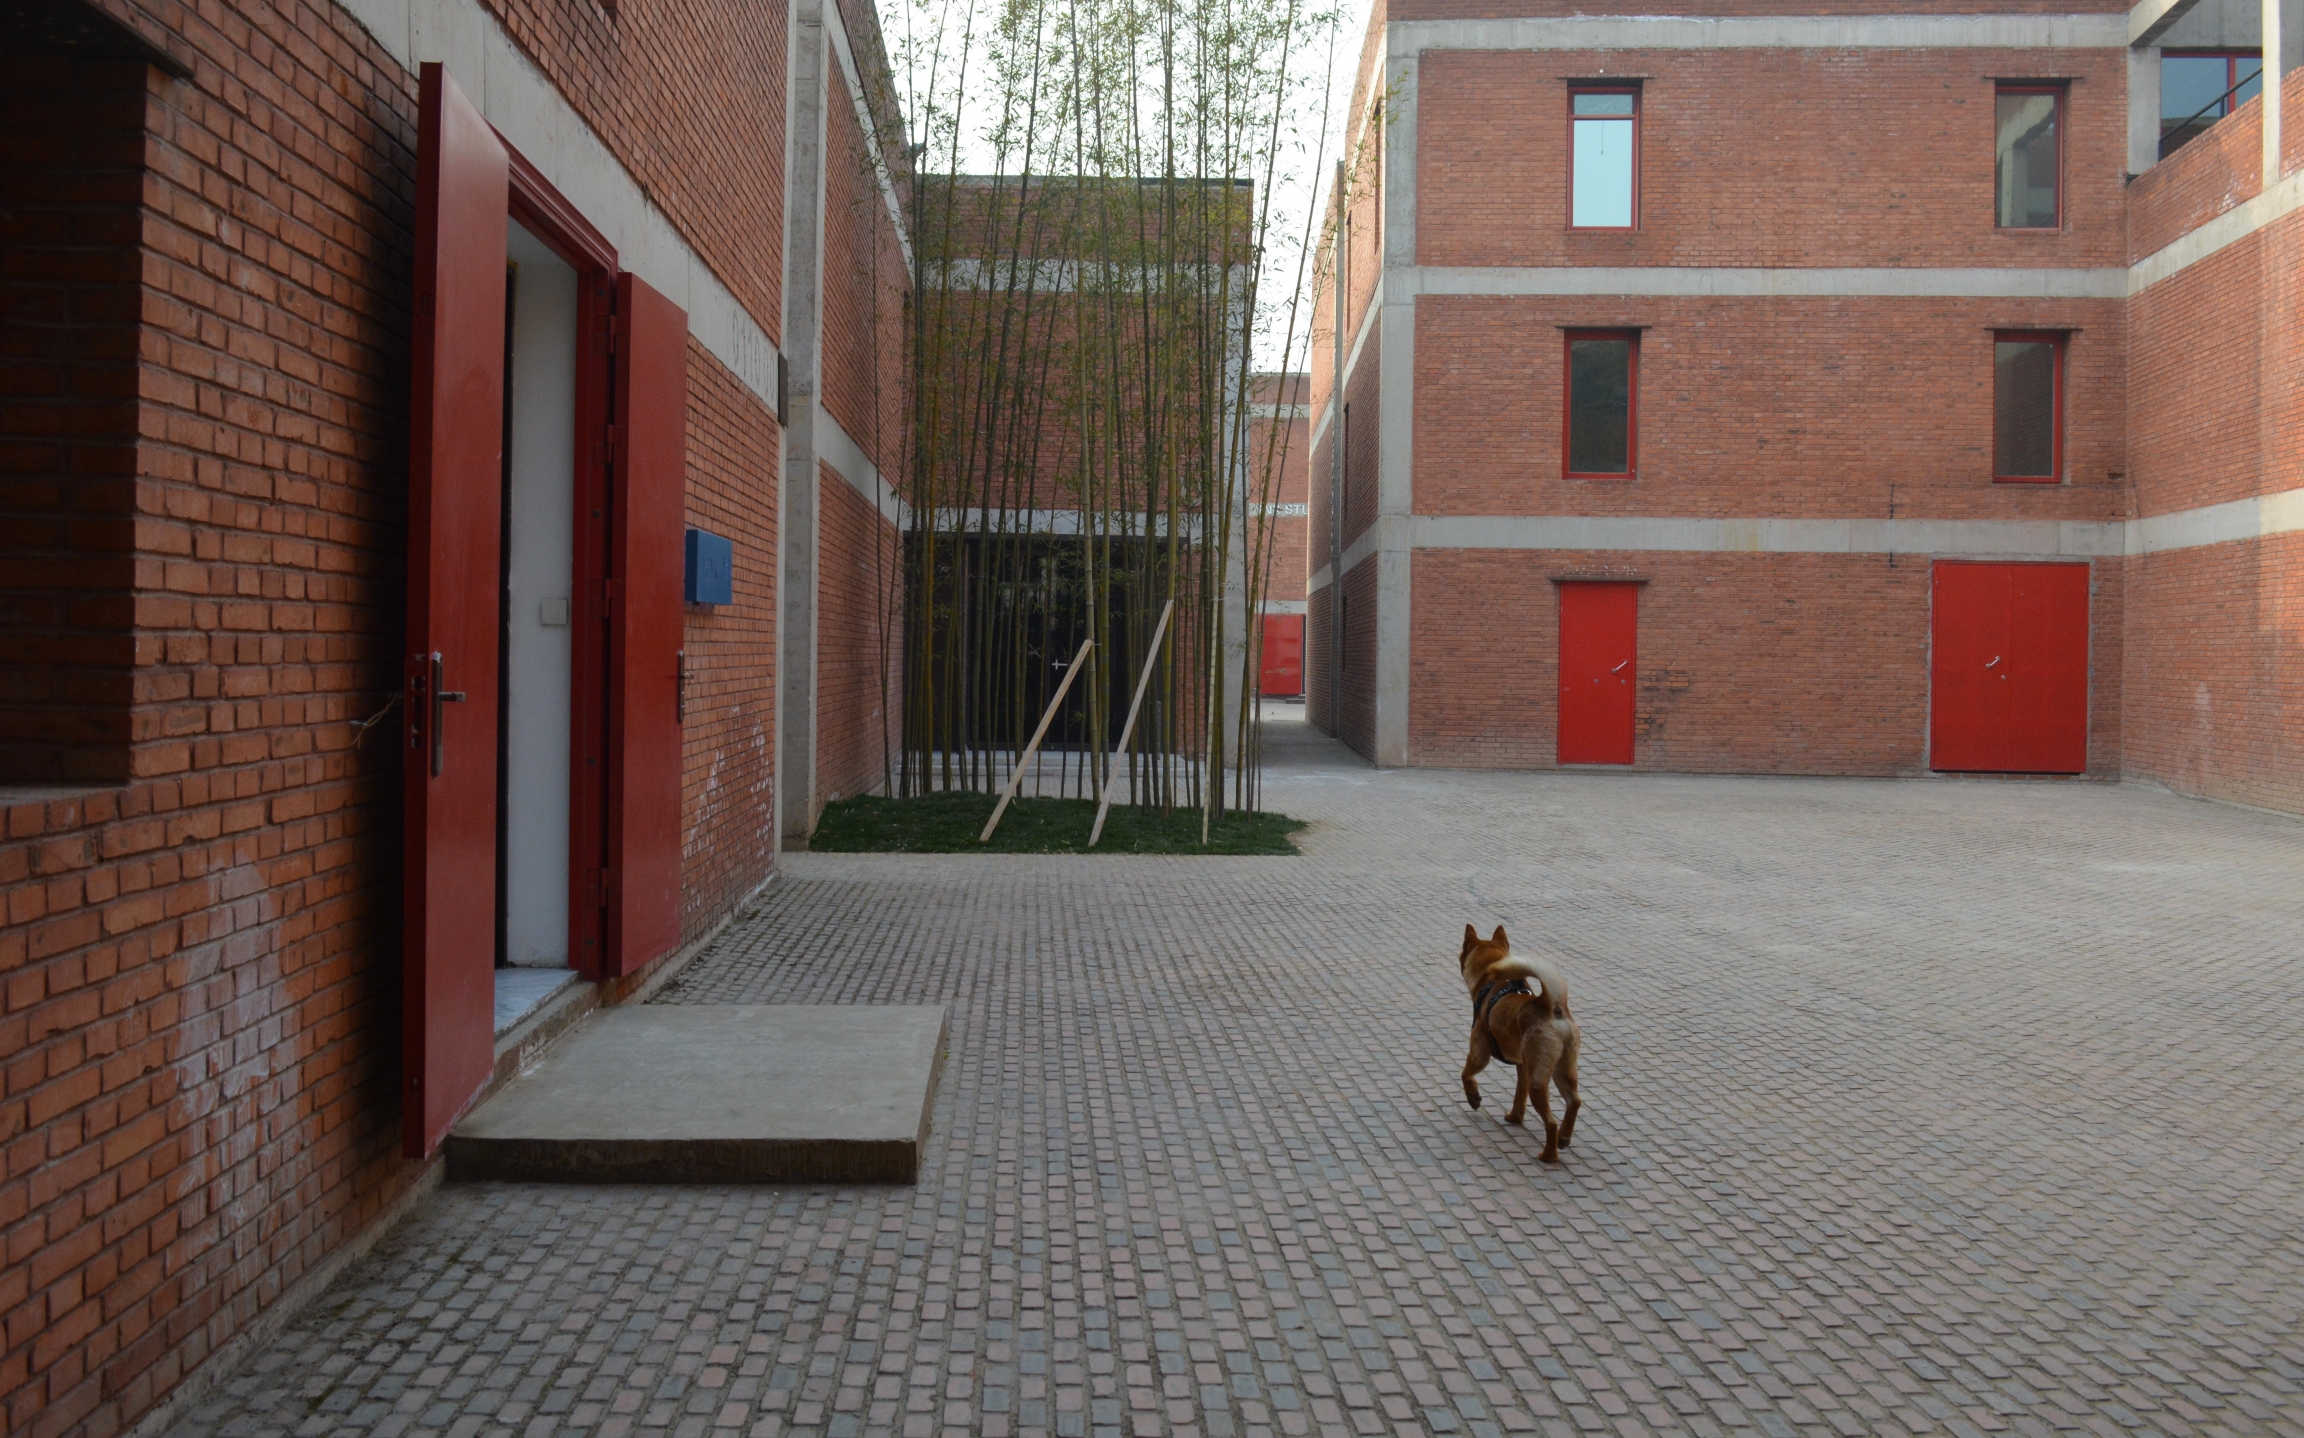 Brick buildings containing galleries